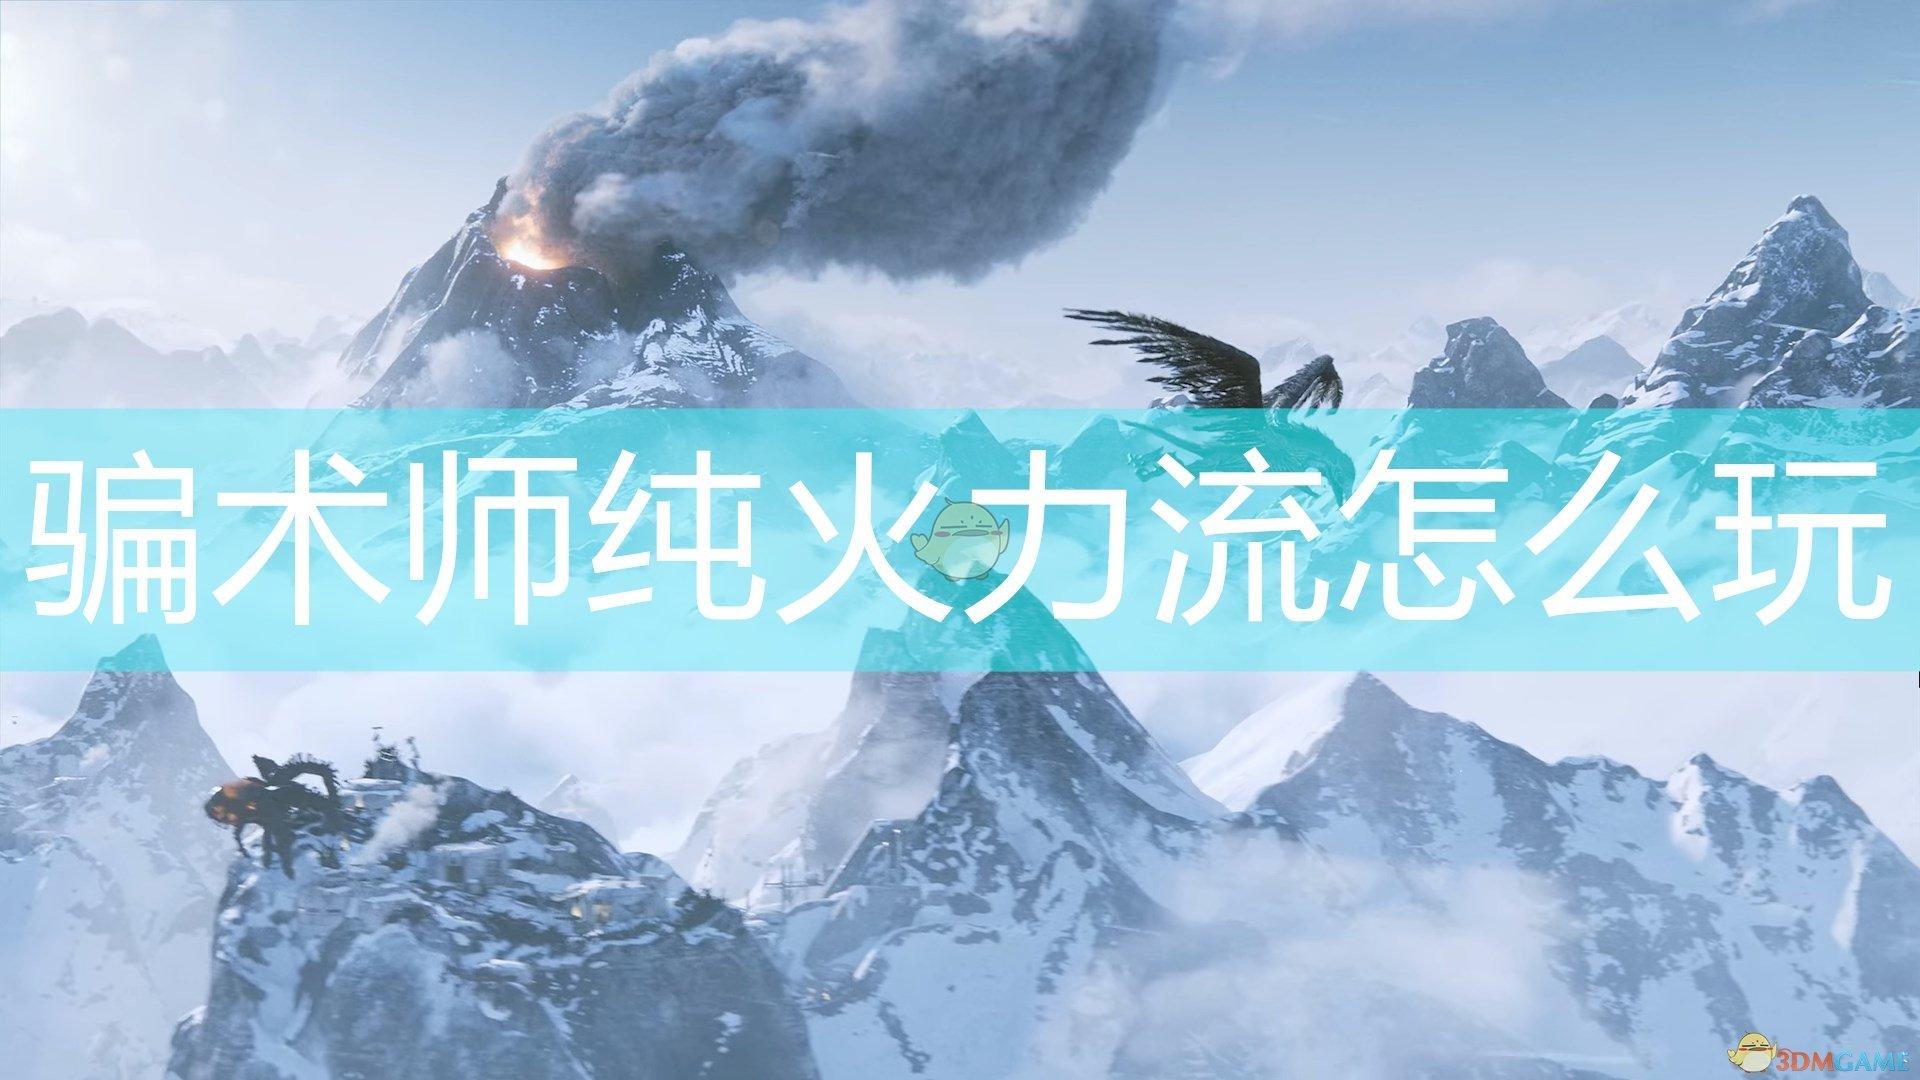 《Outriders》骗术师纯火力流玩法思路介绍